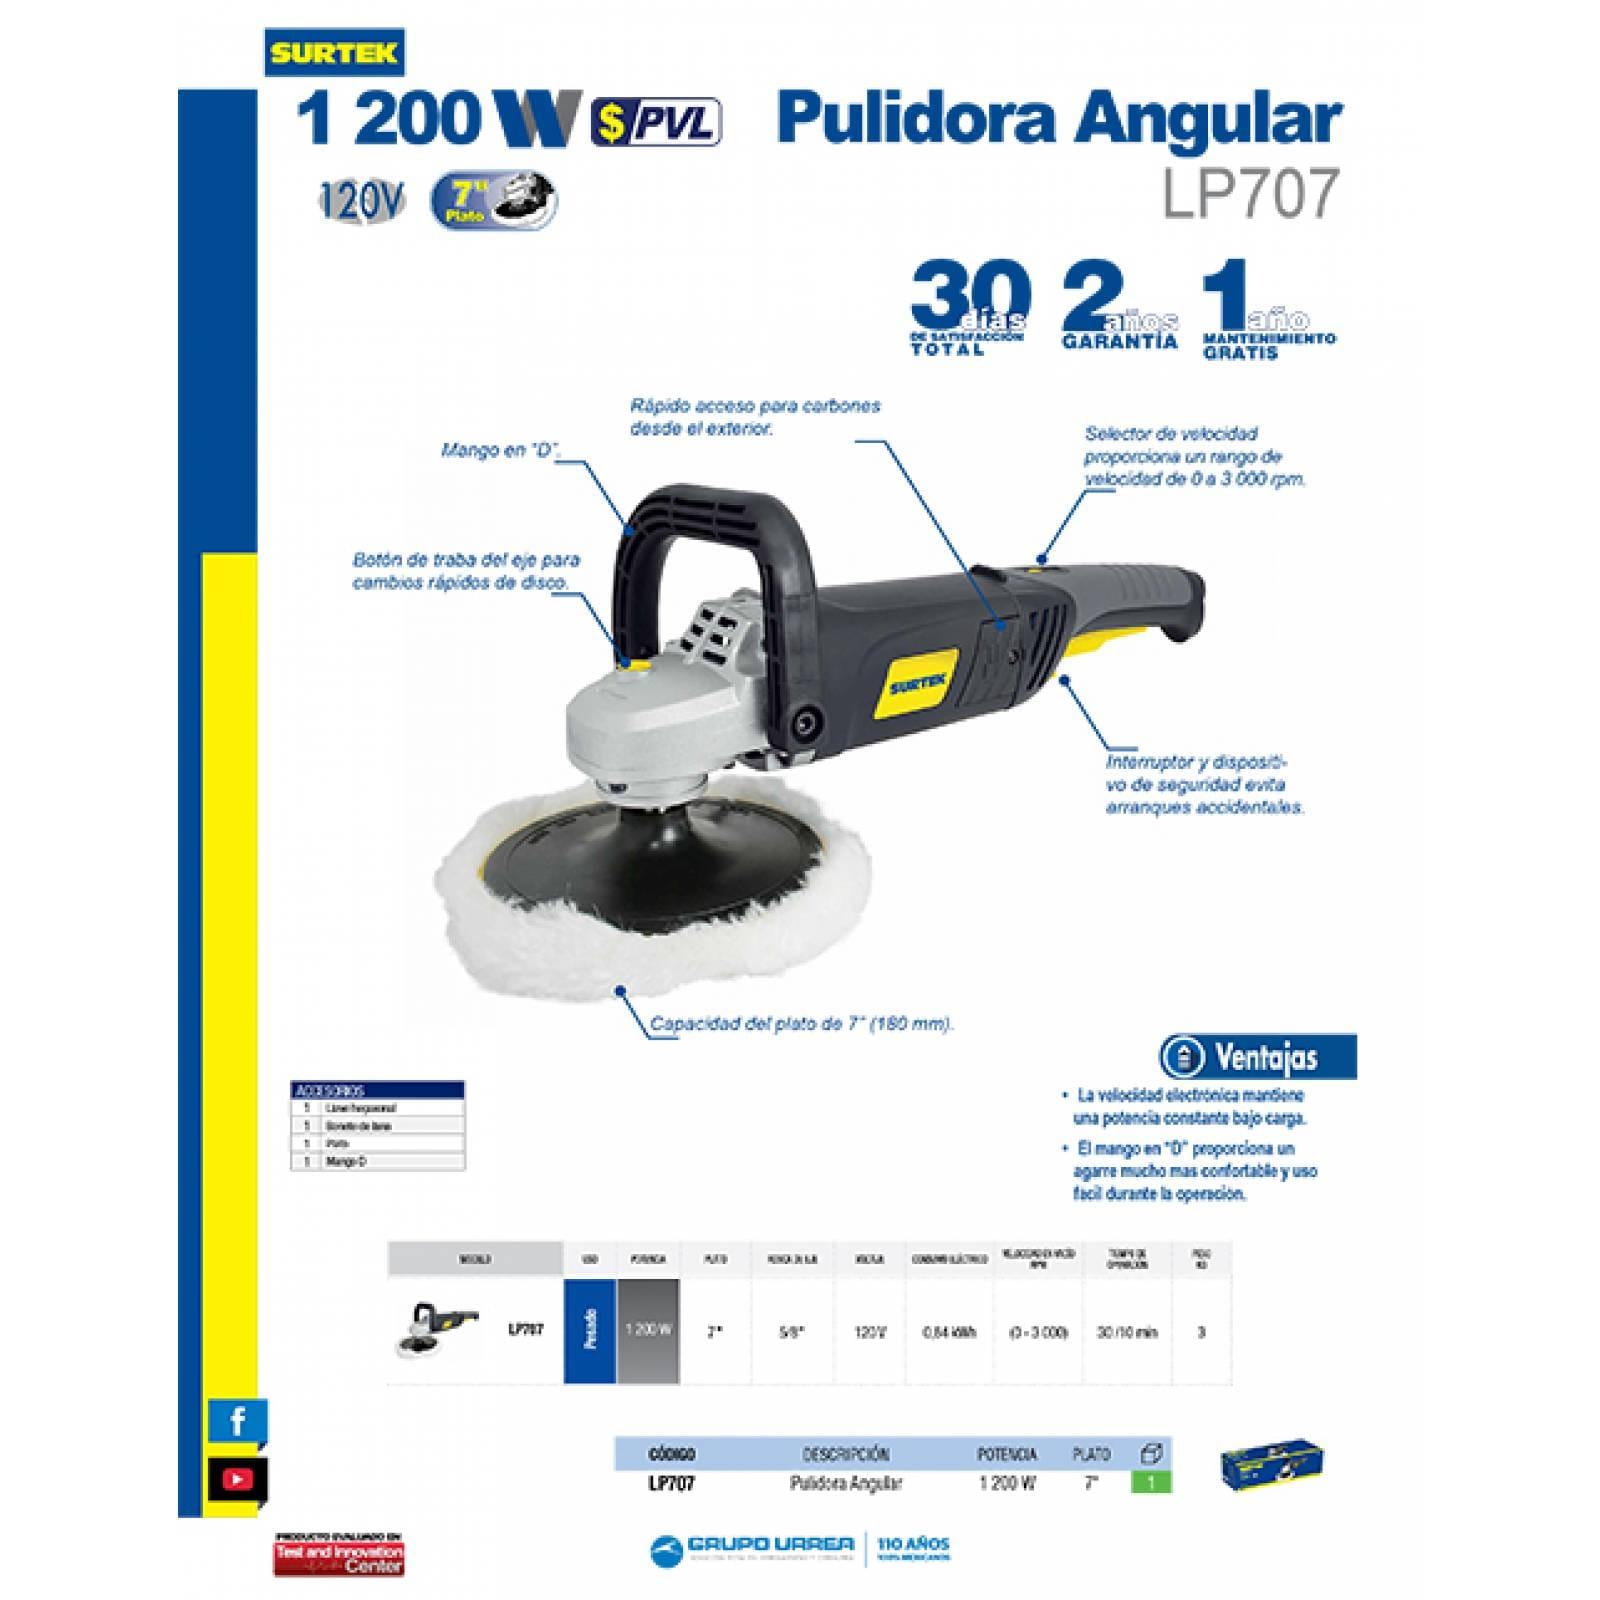 "Pulidora Angular 1200 Watts Plato 7"" 120V 0-3,000 Rpm LP707"